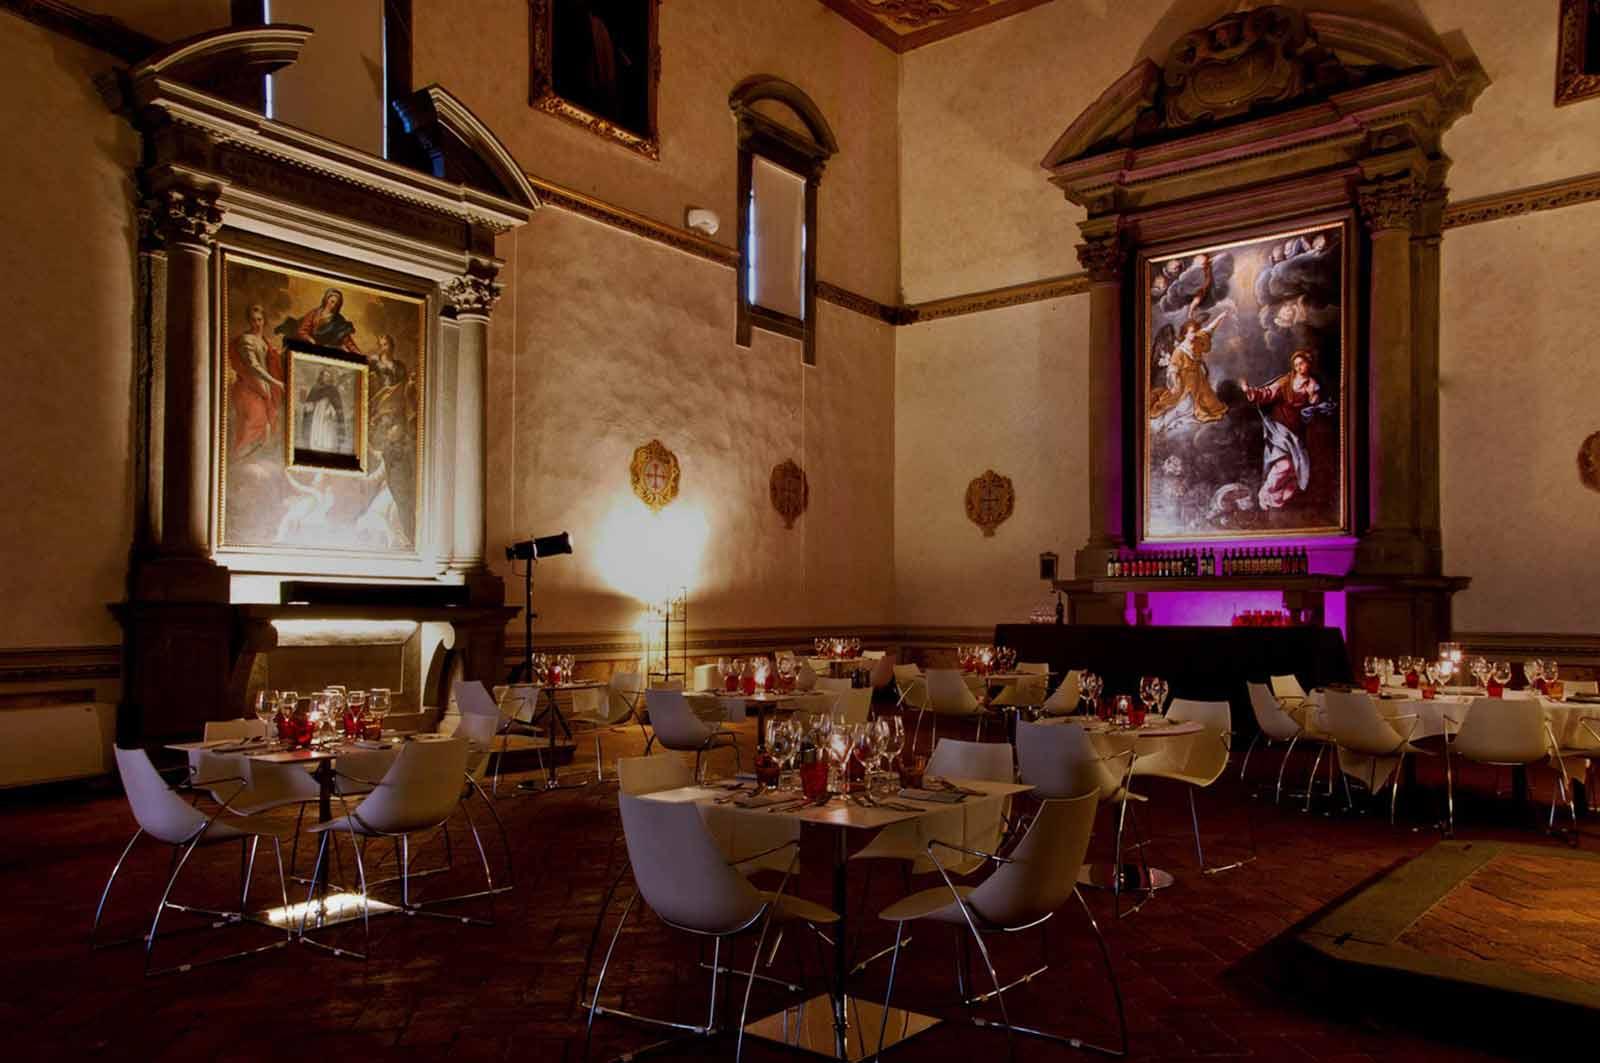 The Renaissance art</br>meets the Tuscan flavors